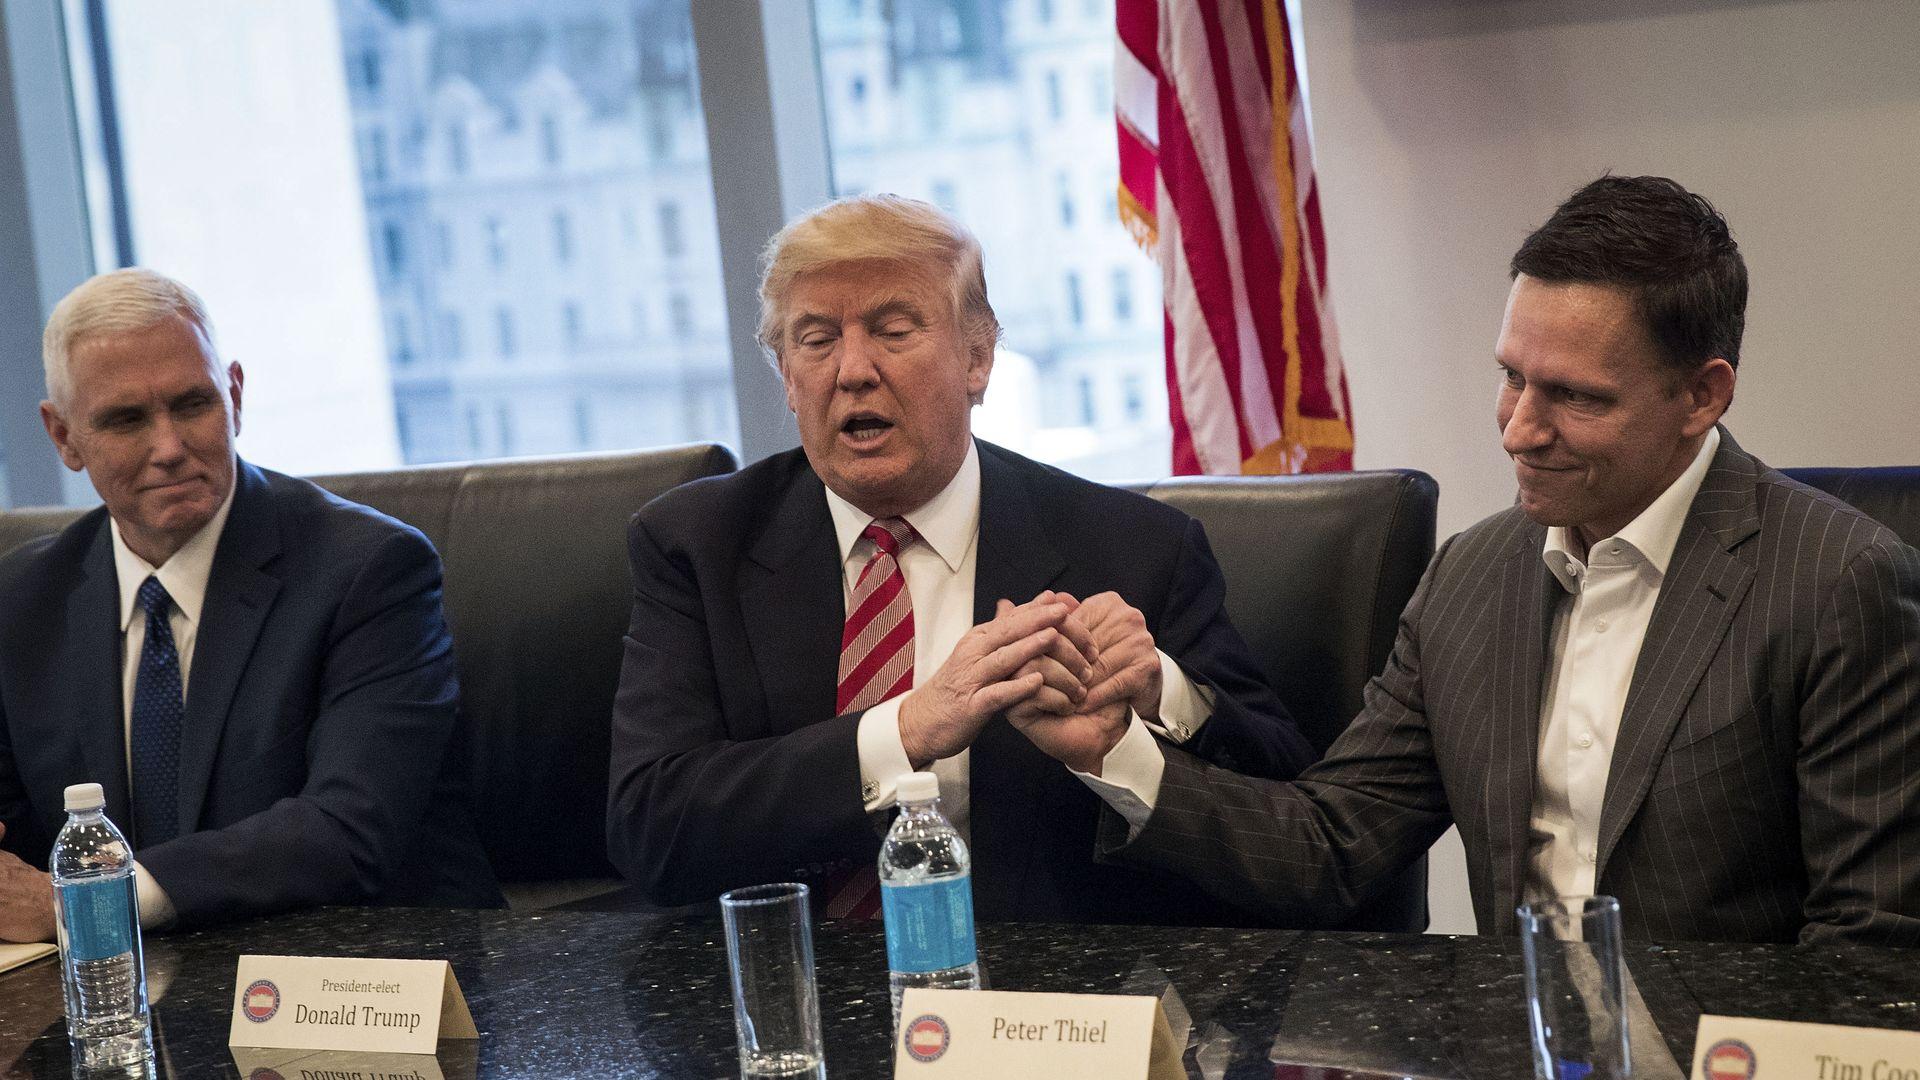 President Trump talking to Peter Thiel.